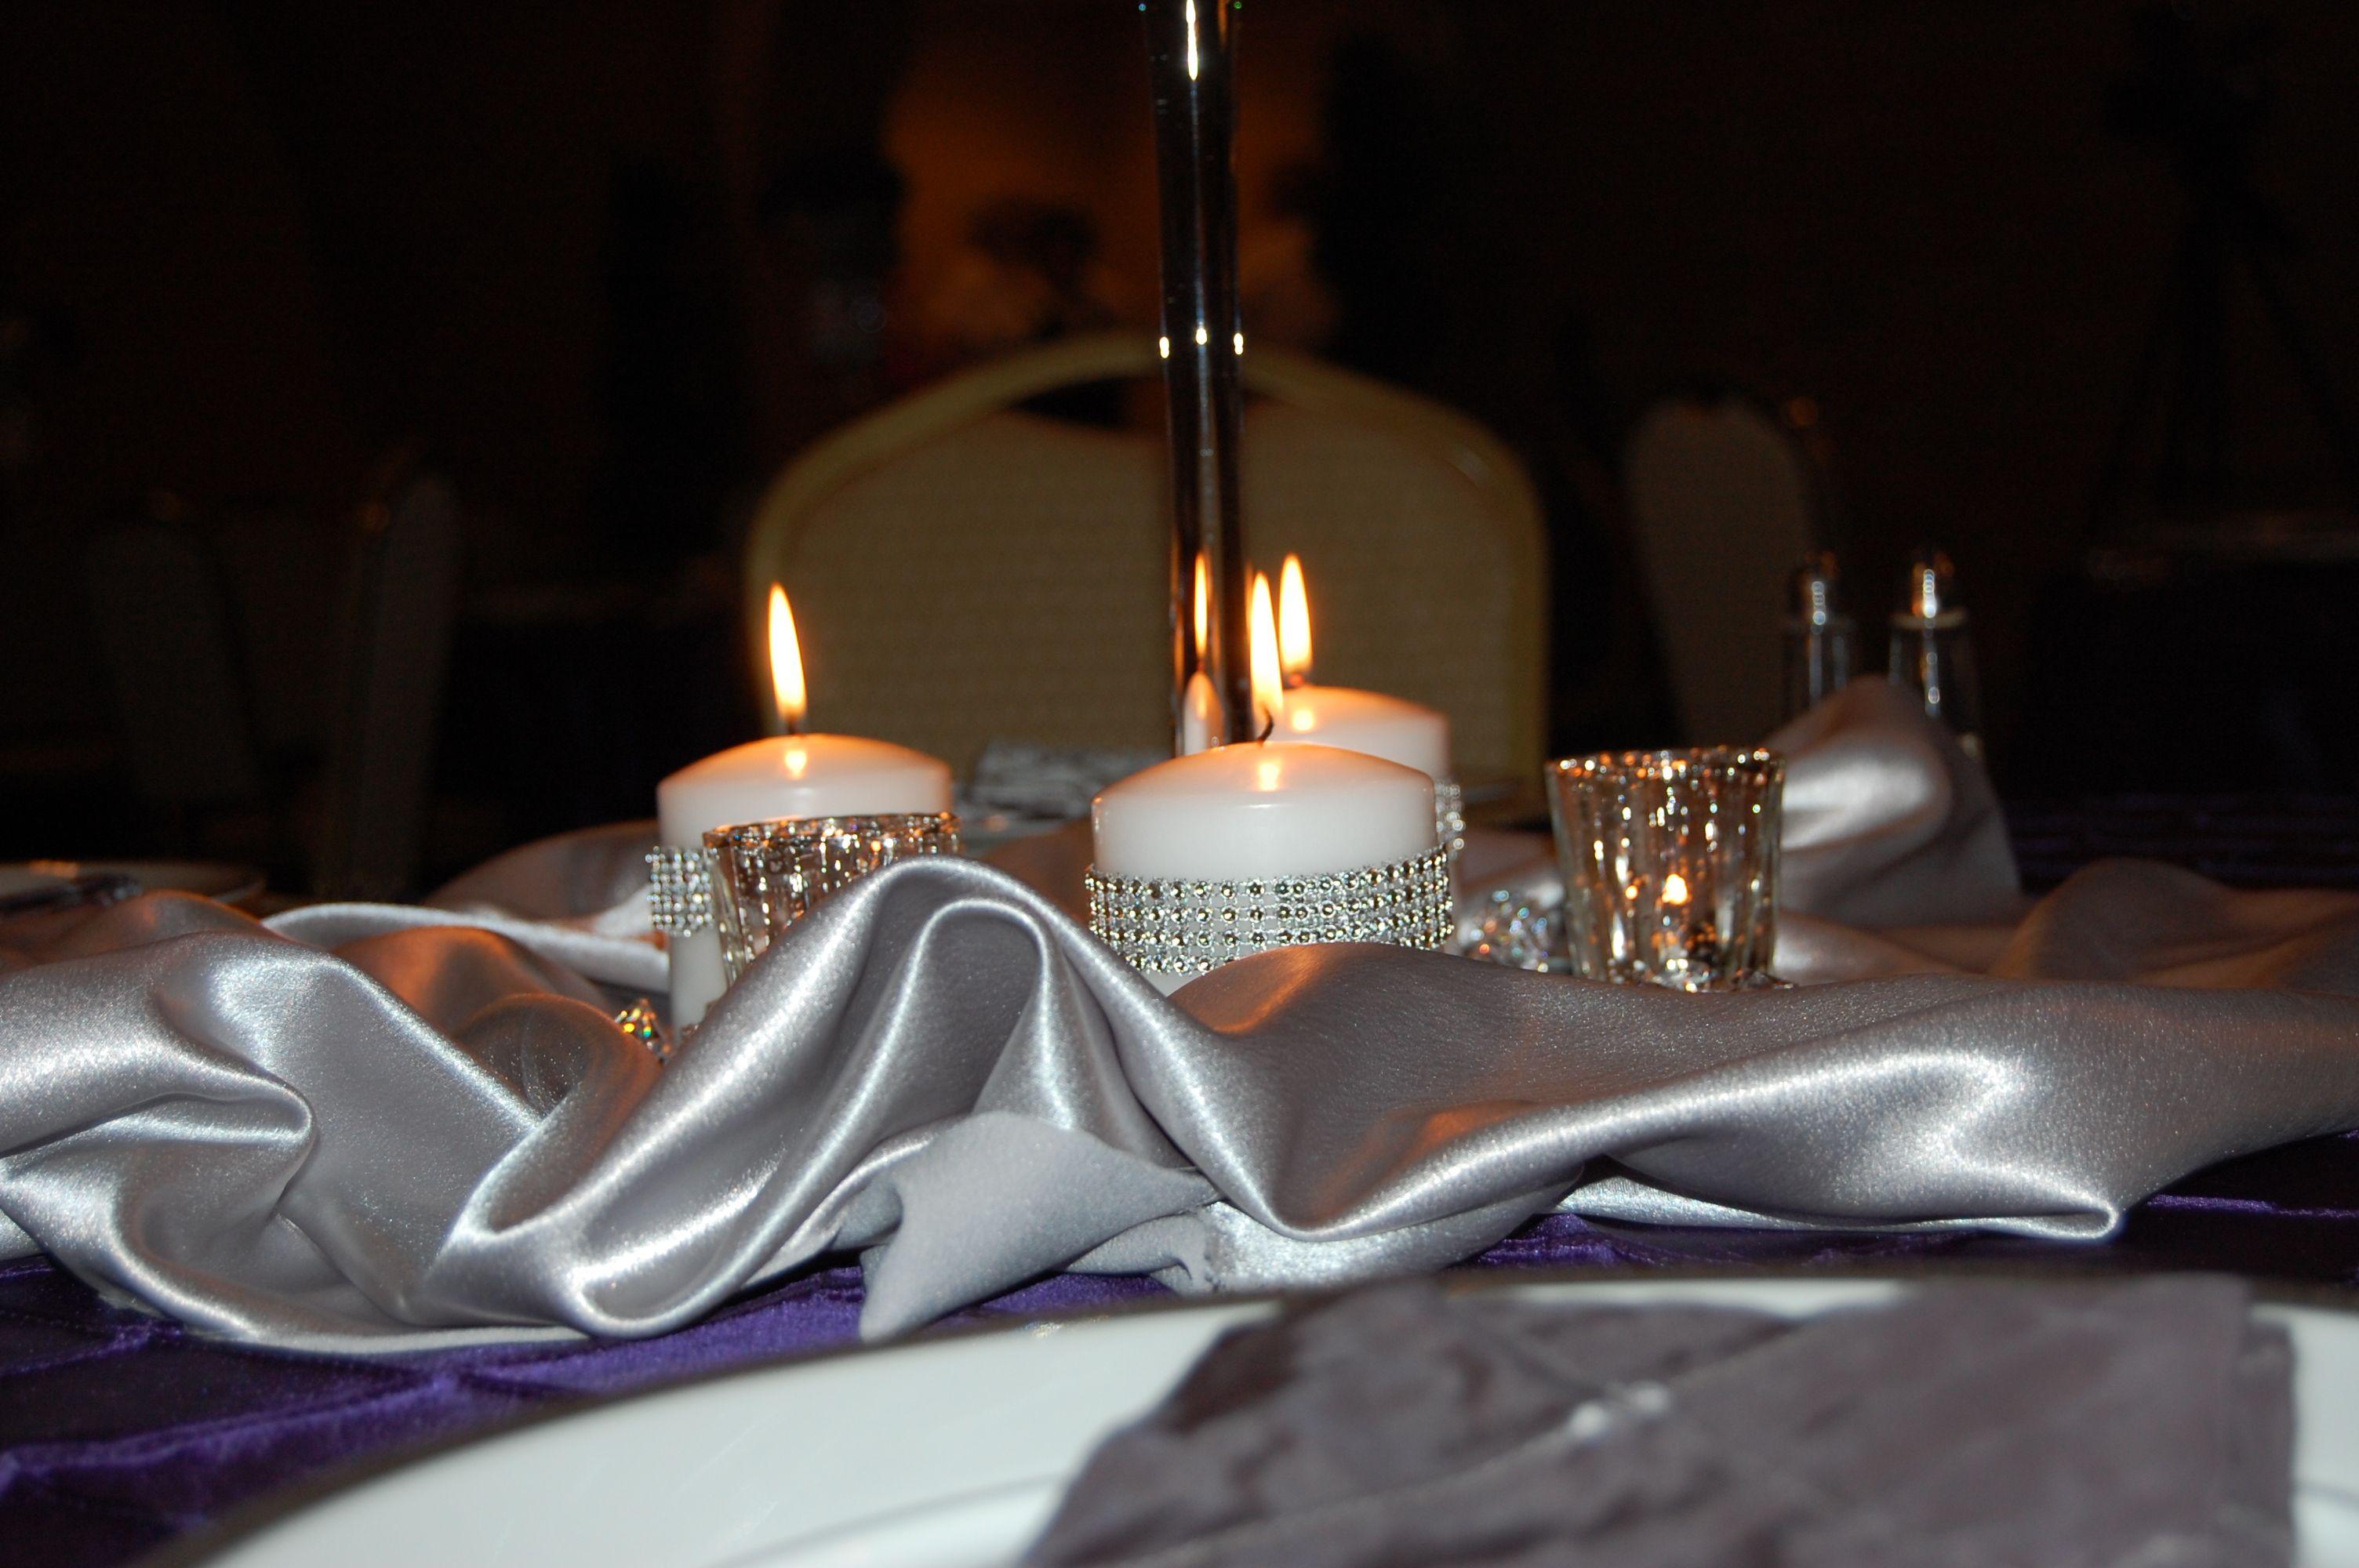 Rehearsal dinner table decorations wedding pinterest for Wedding dinner table decoration